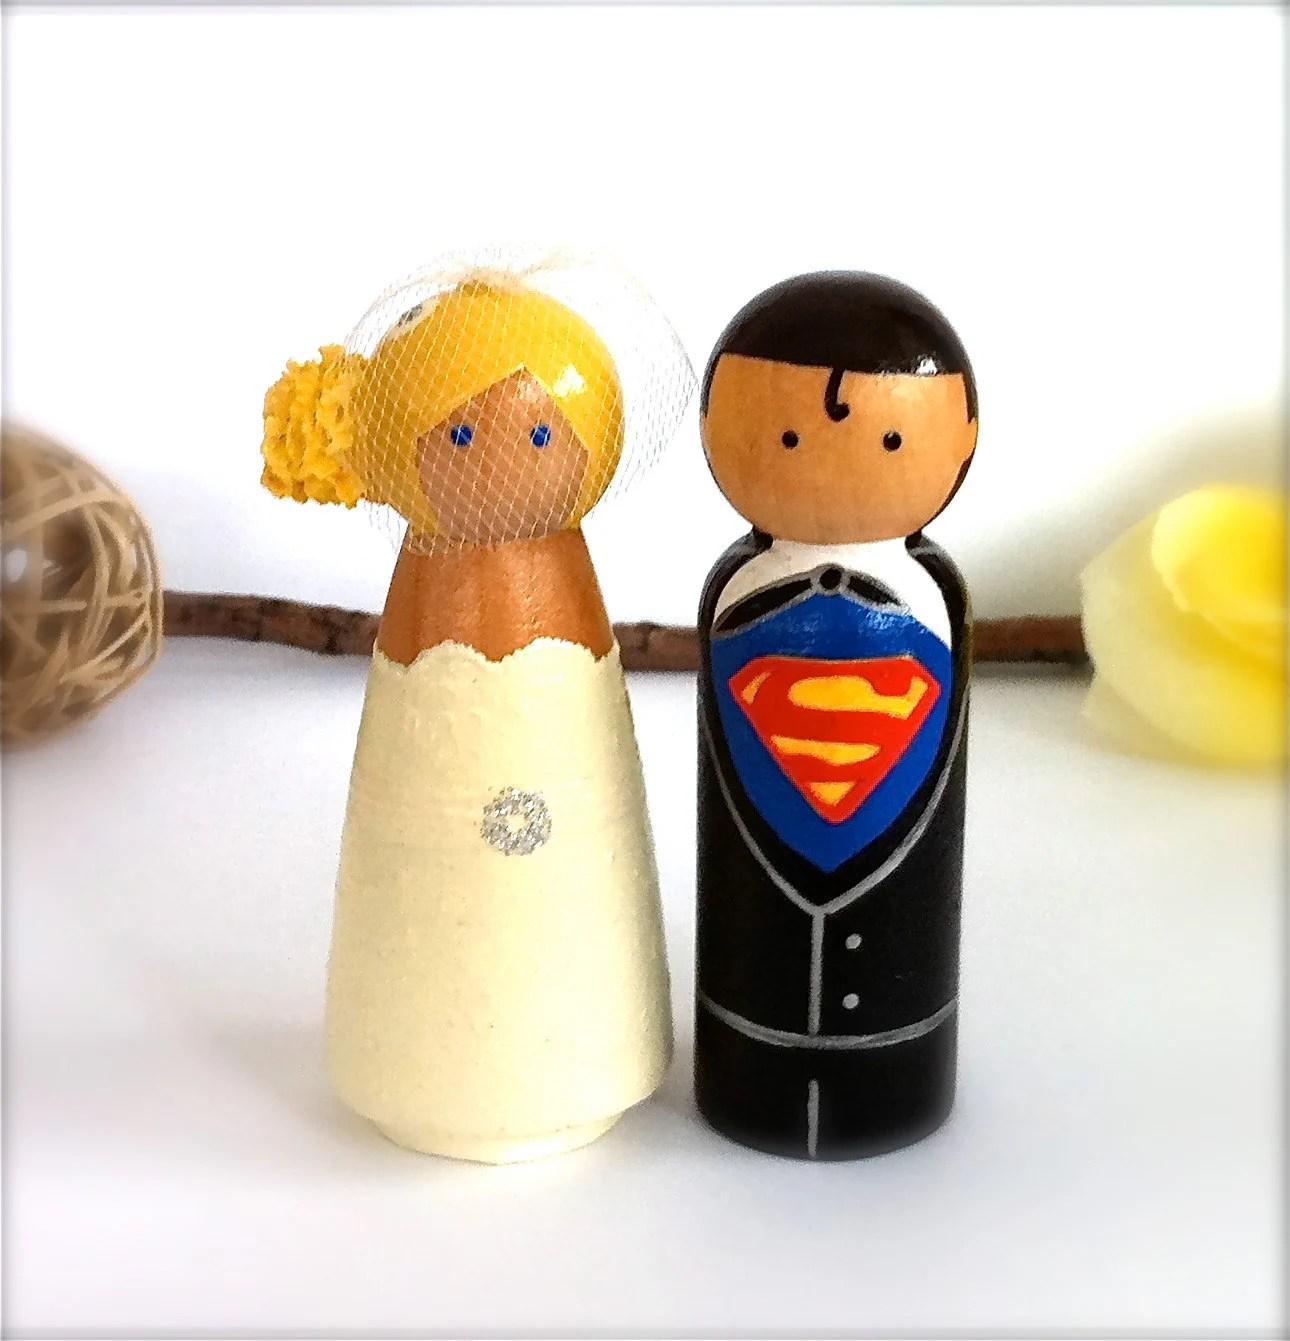 Clark Kent and Lois Lane Superman Wedding Cake Topper Wood Peg Dolls Large Wooden Cake Topper Superhero Bride Groom Keepsake Themed